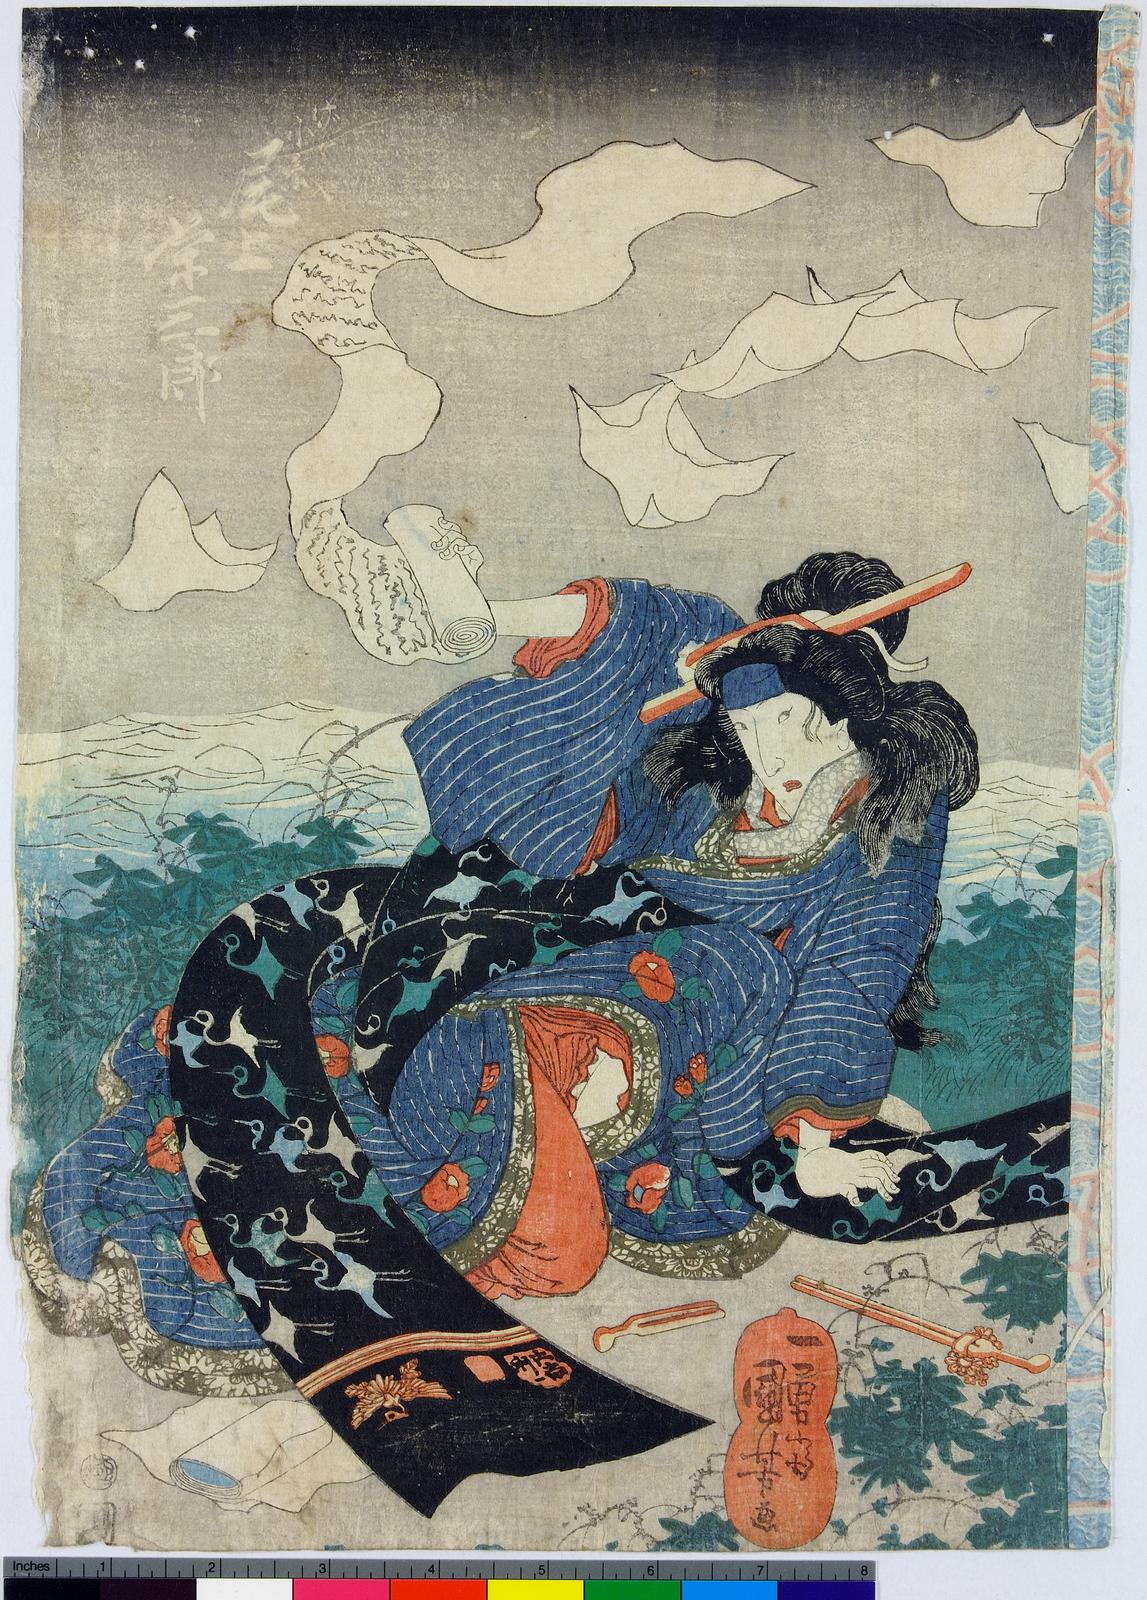 File:Diptych print (BM 1906,1220,0.1123).jpg - Wikimedia